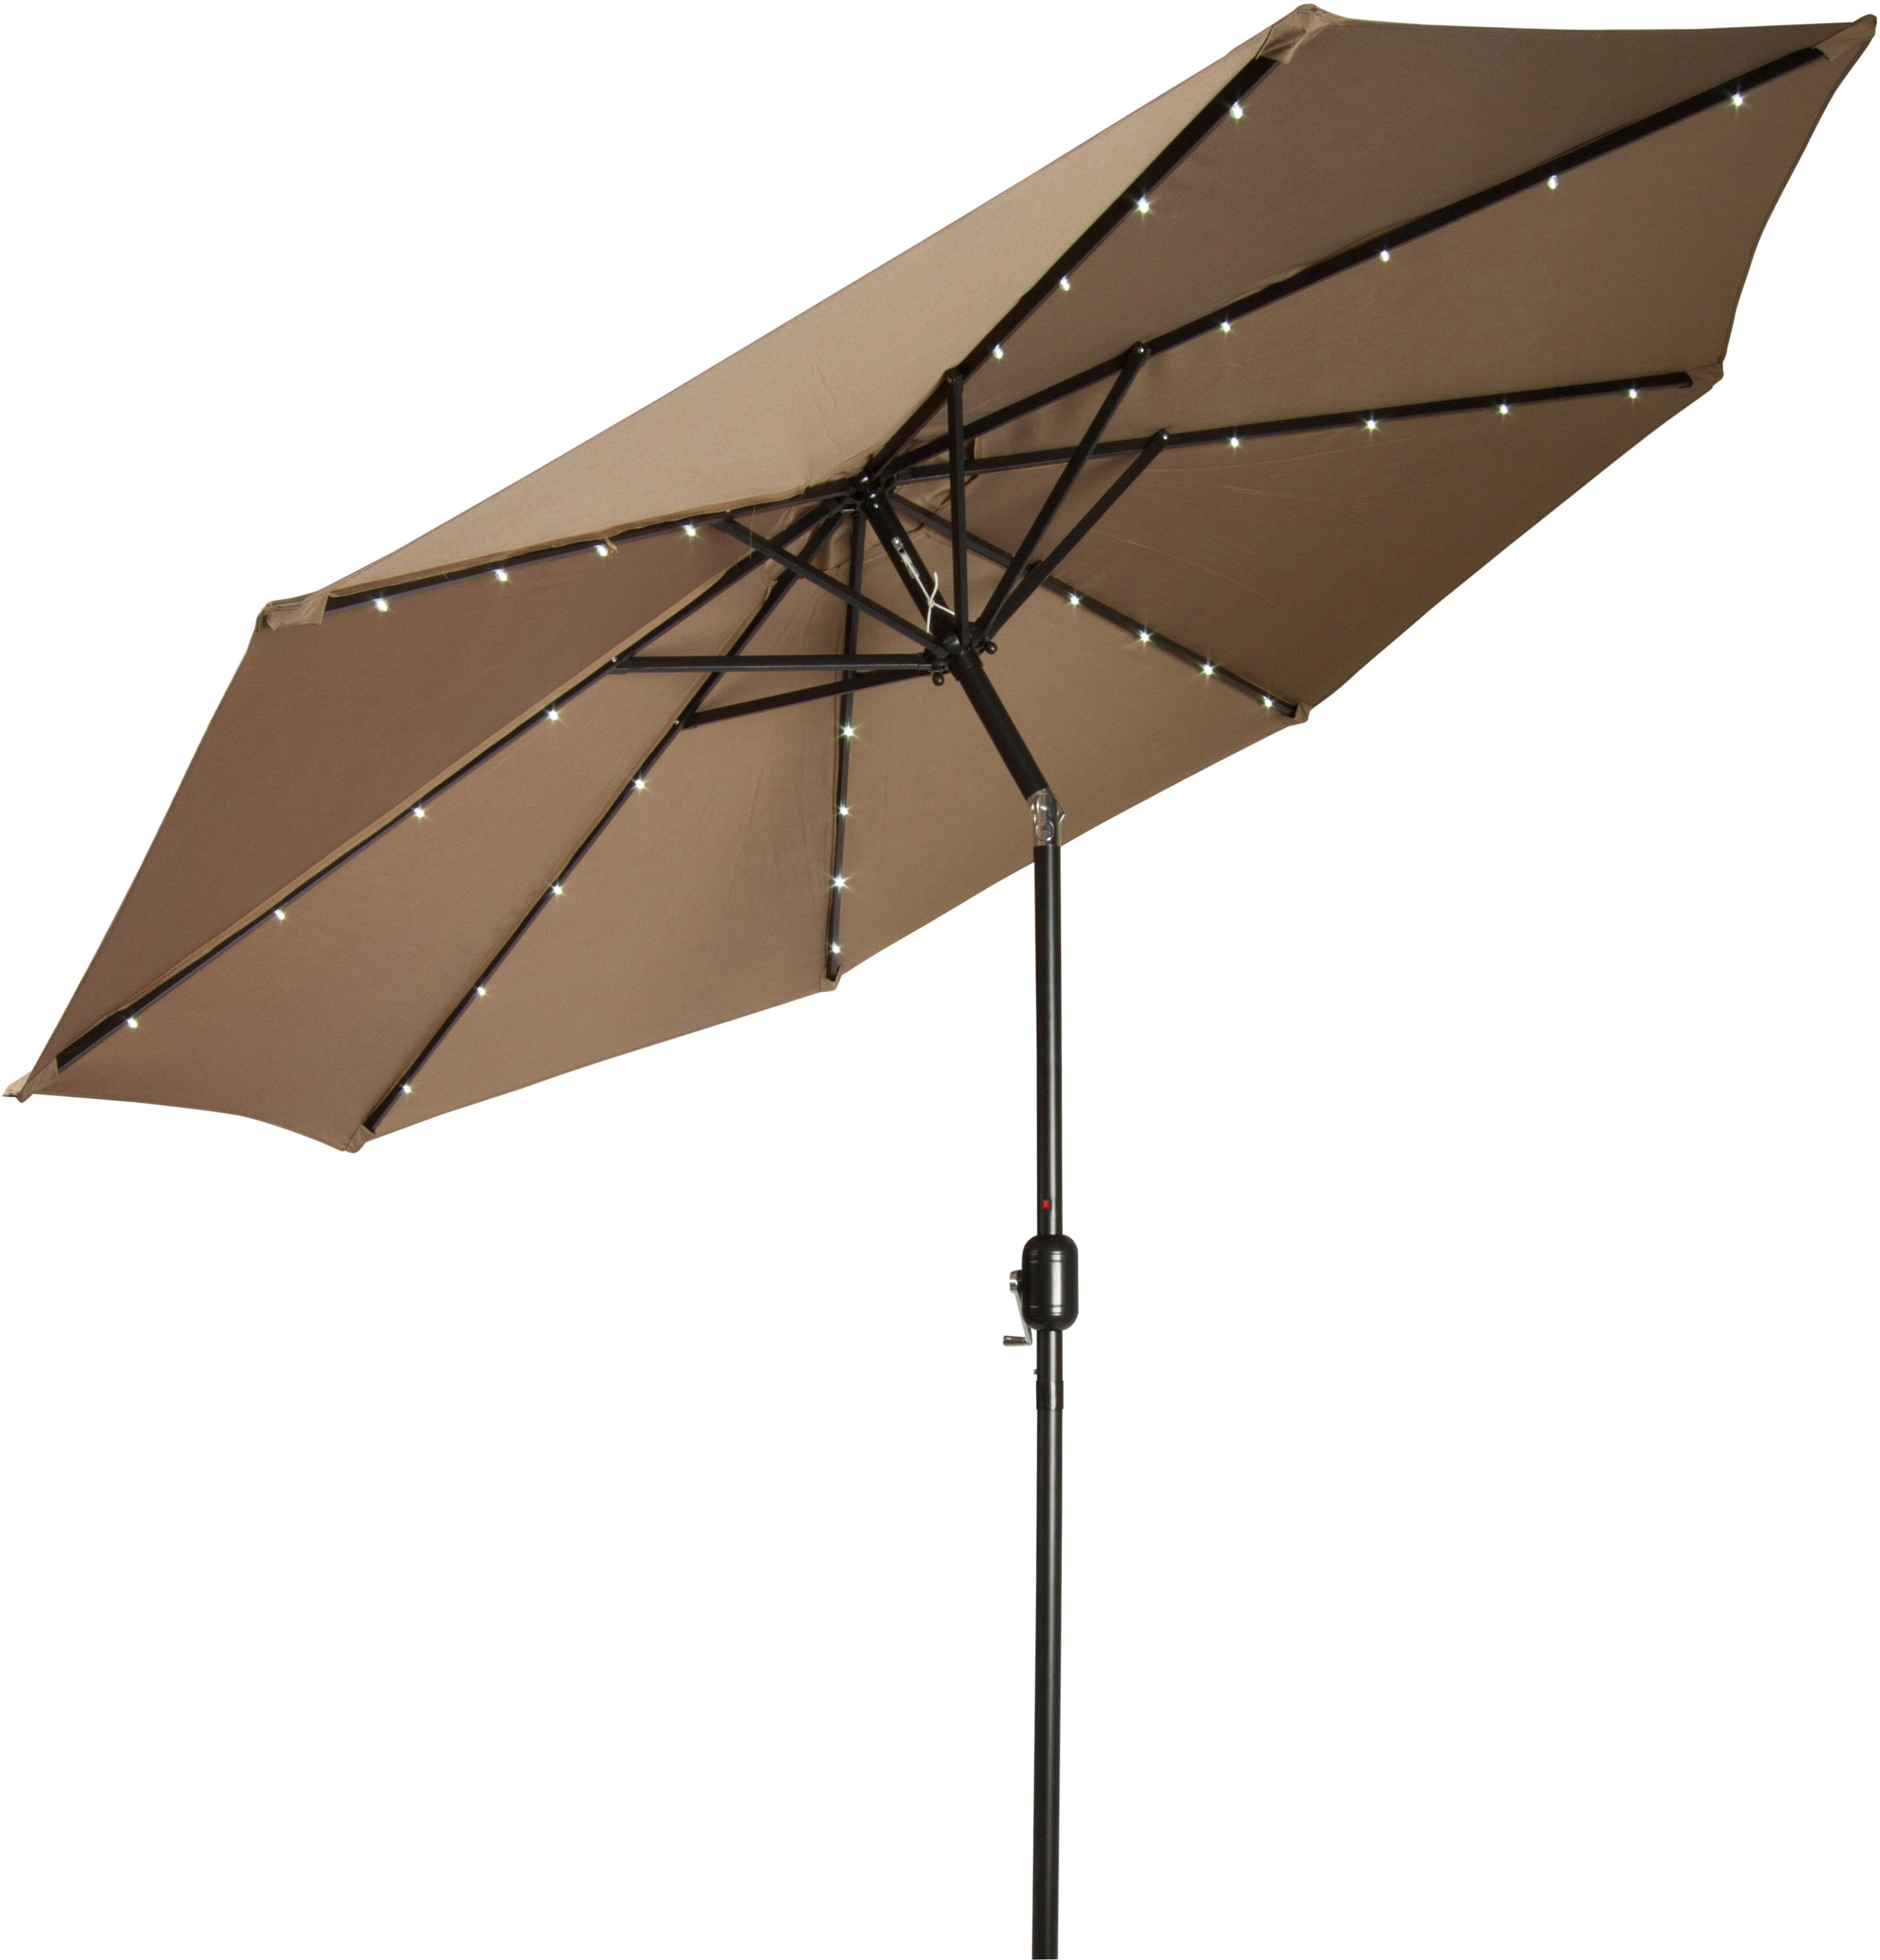 Latest Woll 9' Lighted Market Umbrella Regarding Launceston Market Umbrellas (View 3 of 20)